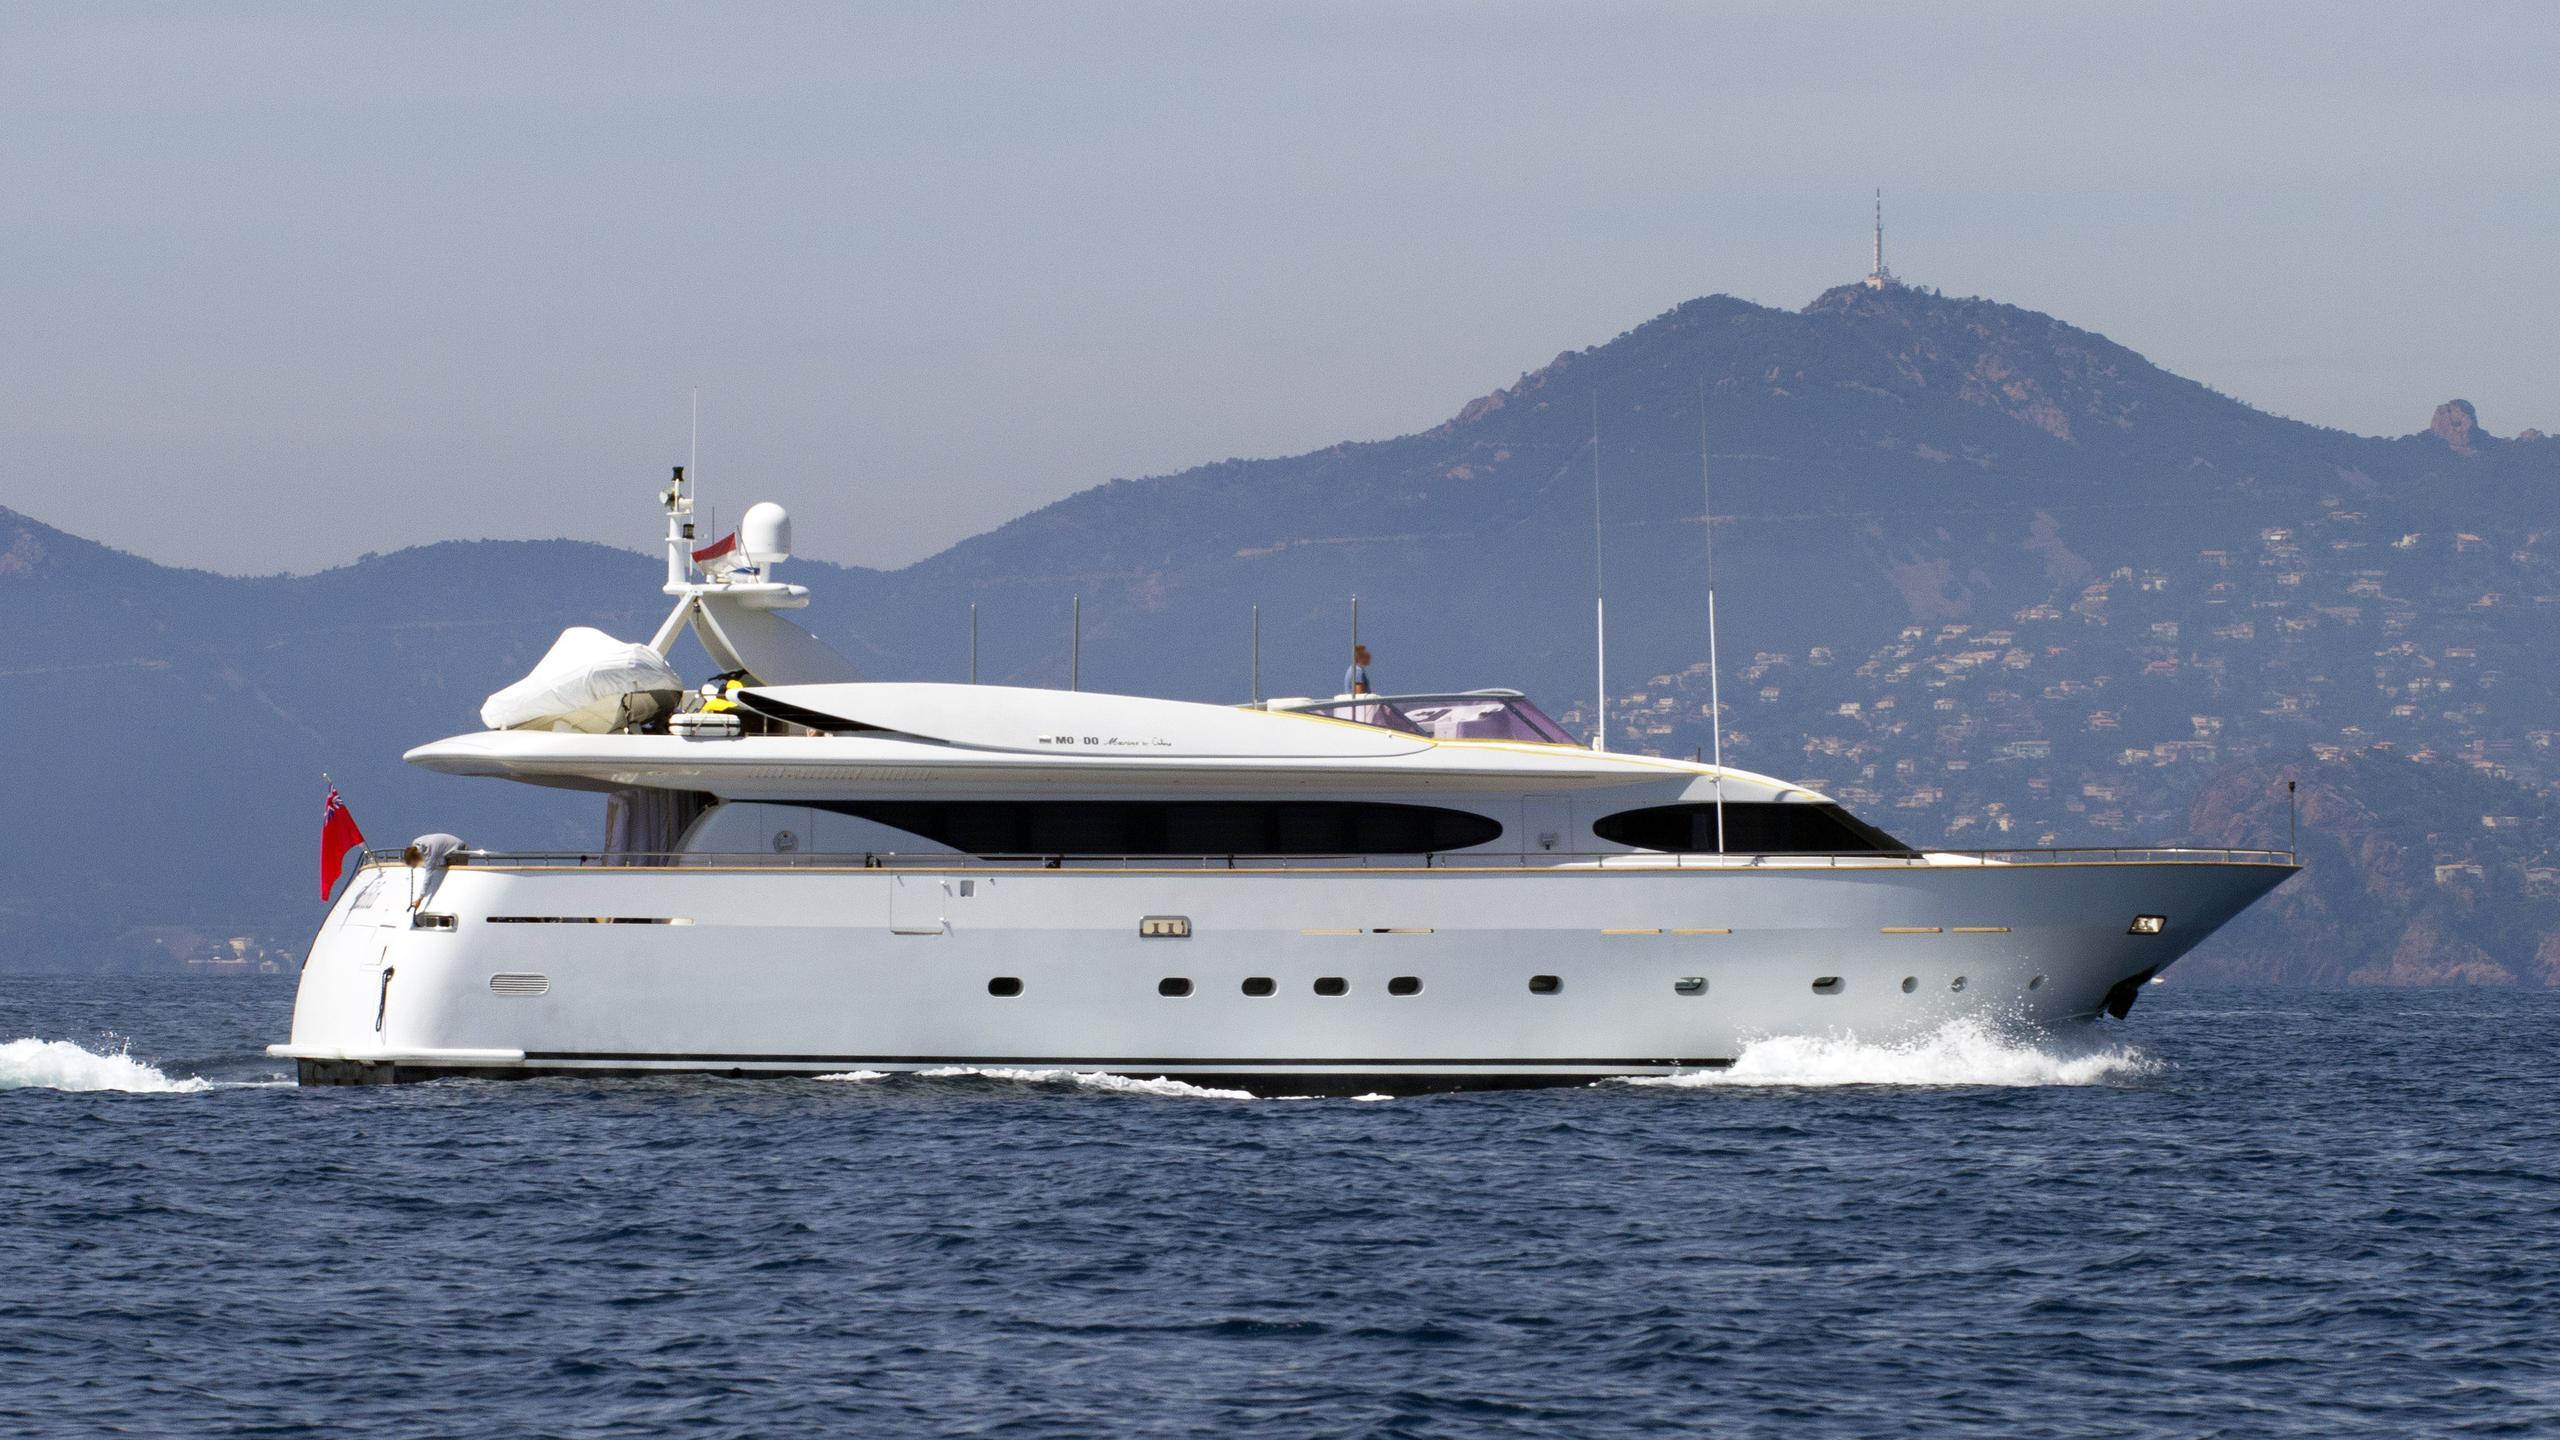 talila-motor-yacht-mondomarine-mondo-29m-2000-28m-running-profile